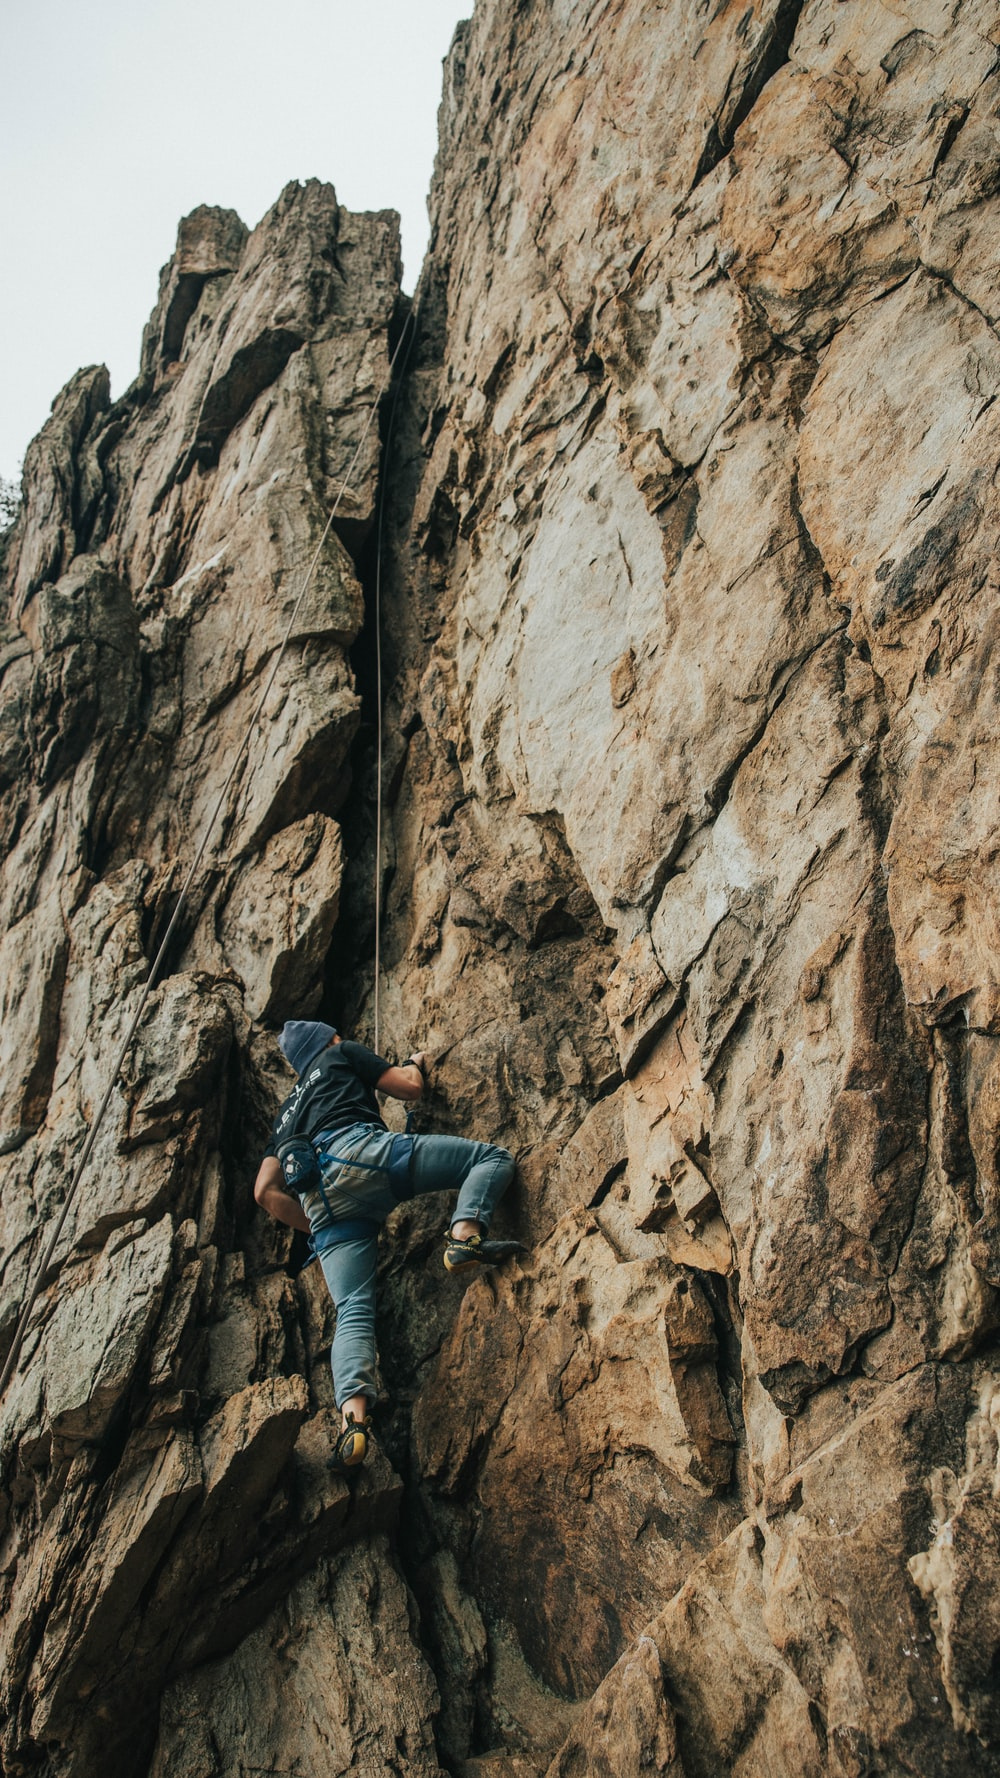 man in black jacket climbing on brown rocky mountain during daytime